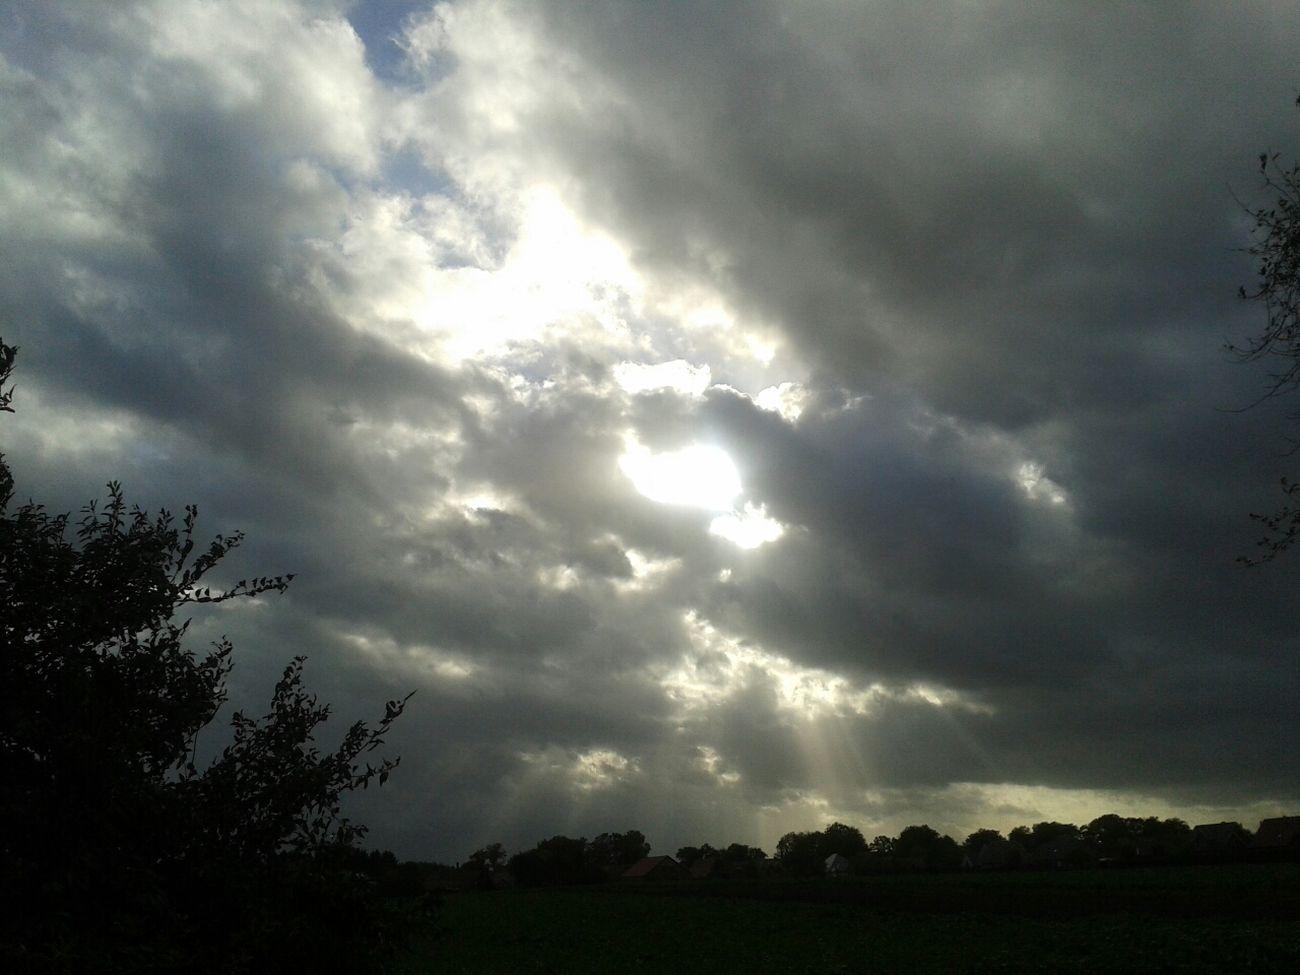 15 Uhr der Himmel über Altenberge in Haren_Ems